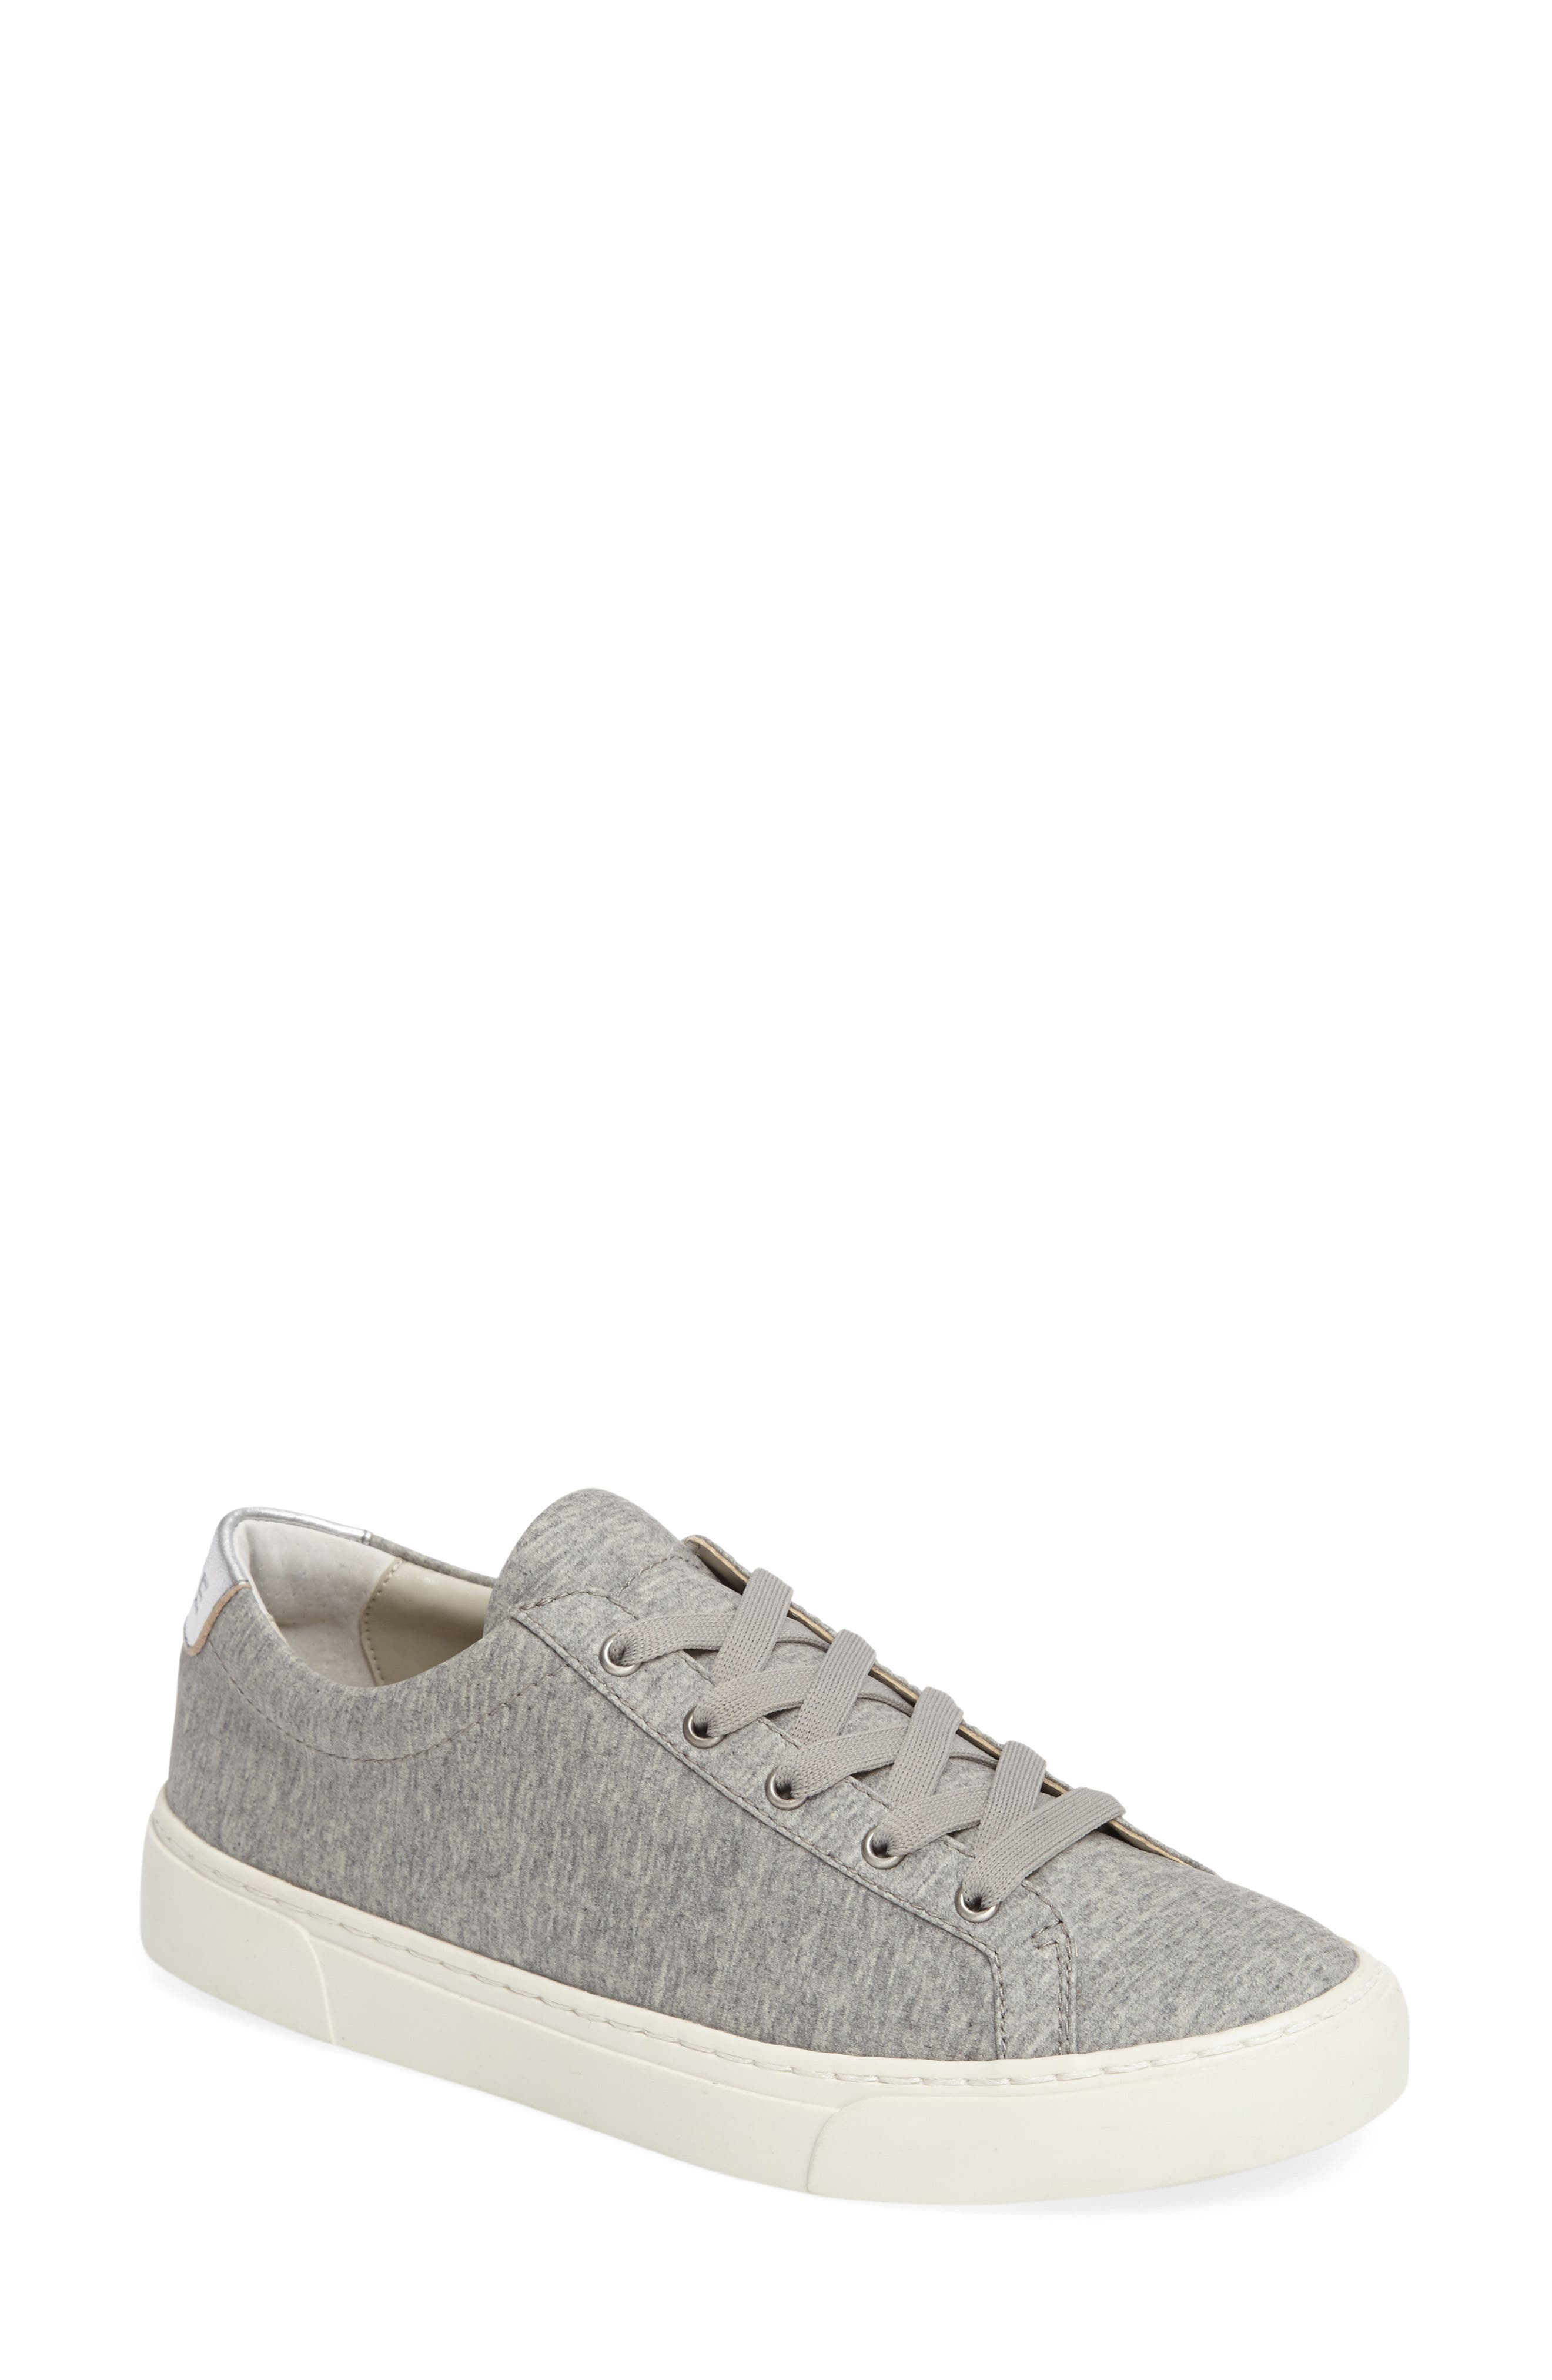 Darrion Sneaker,                         Main,                         color, 020